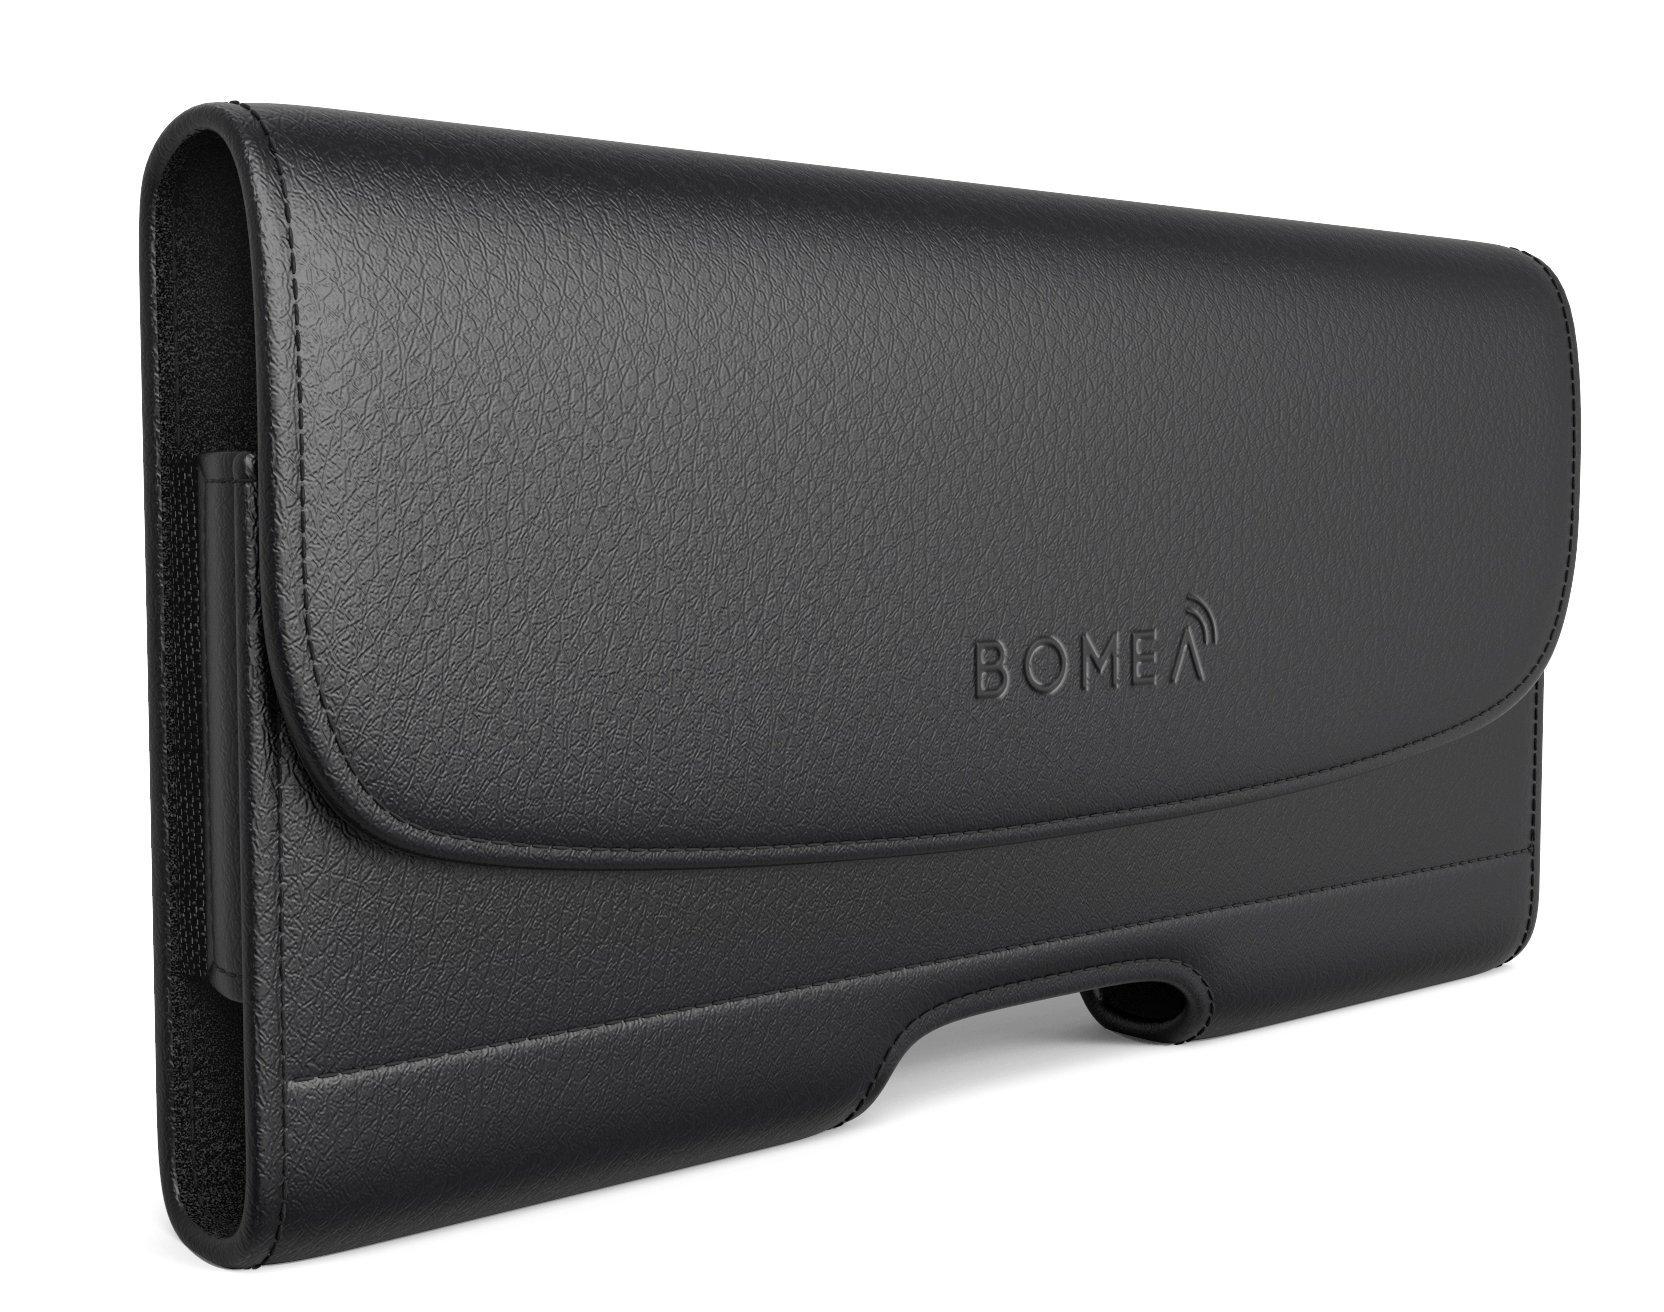 promo code 7d1f5 0d459 Cheap Iphone 5 Holder Belt, find Iphone 5 Holder Belt deals on line ...